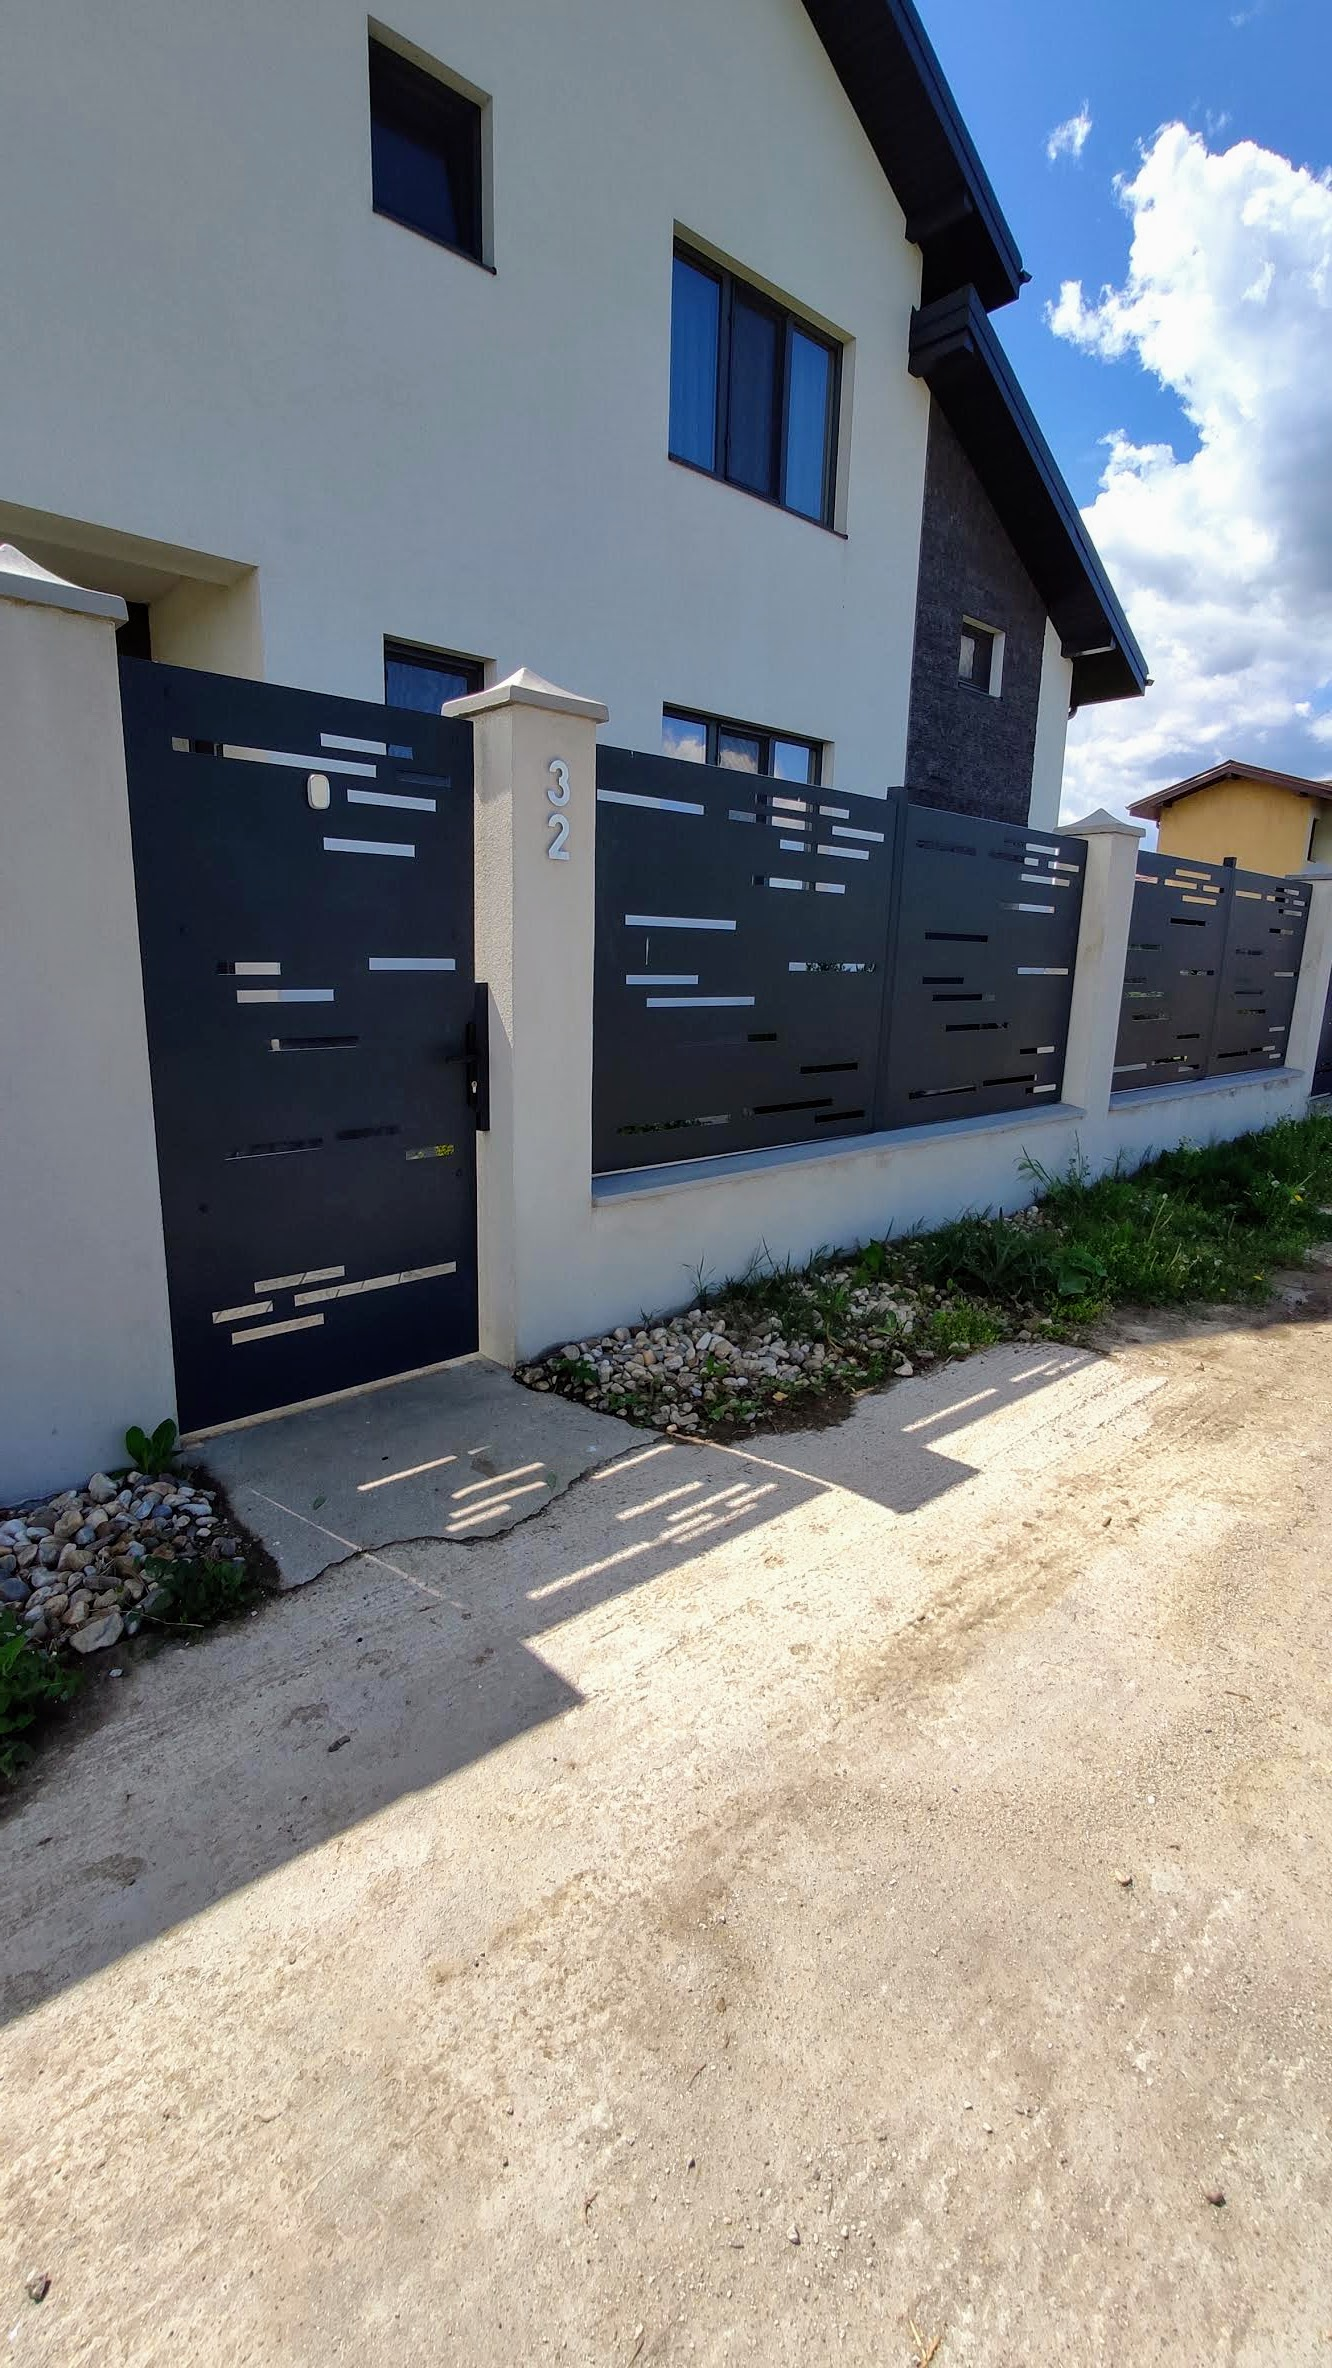 Gard Beton Panouri Metalice Poarta Curte